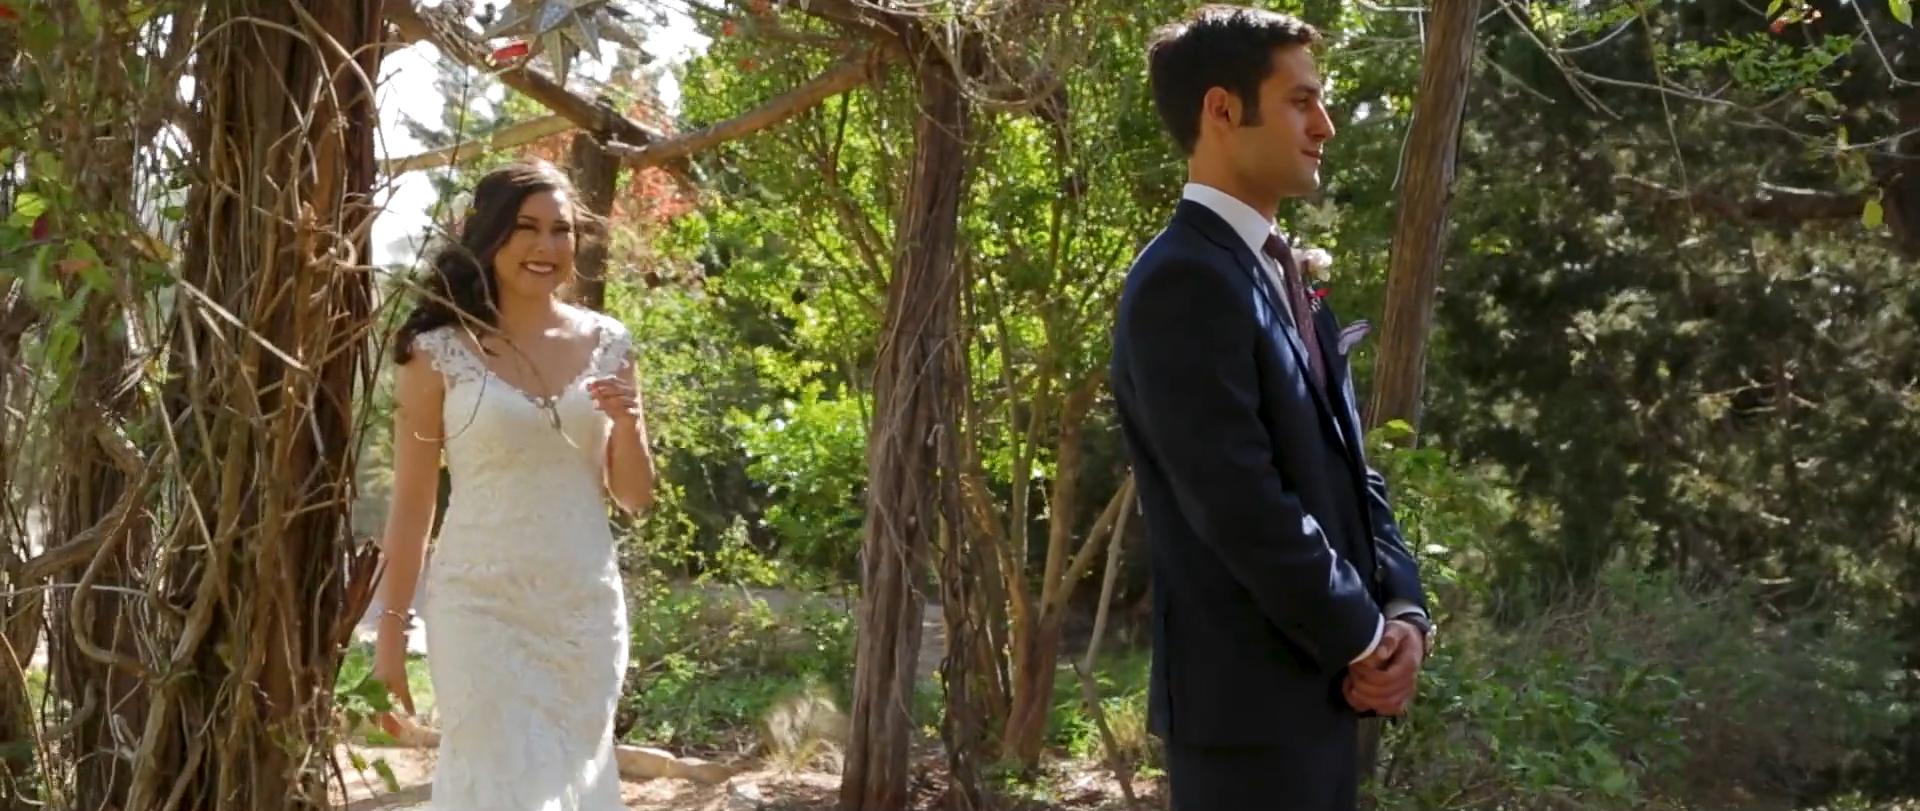 first look bride groom wedding videographer